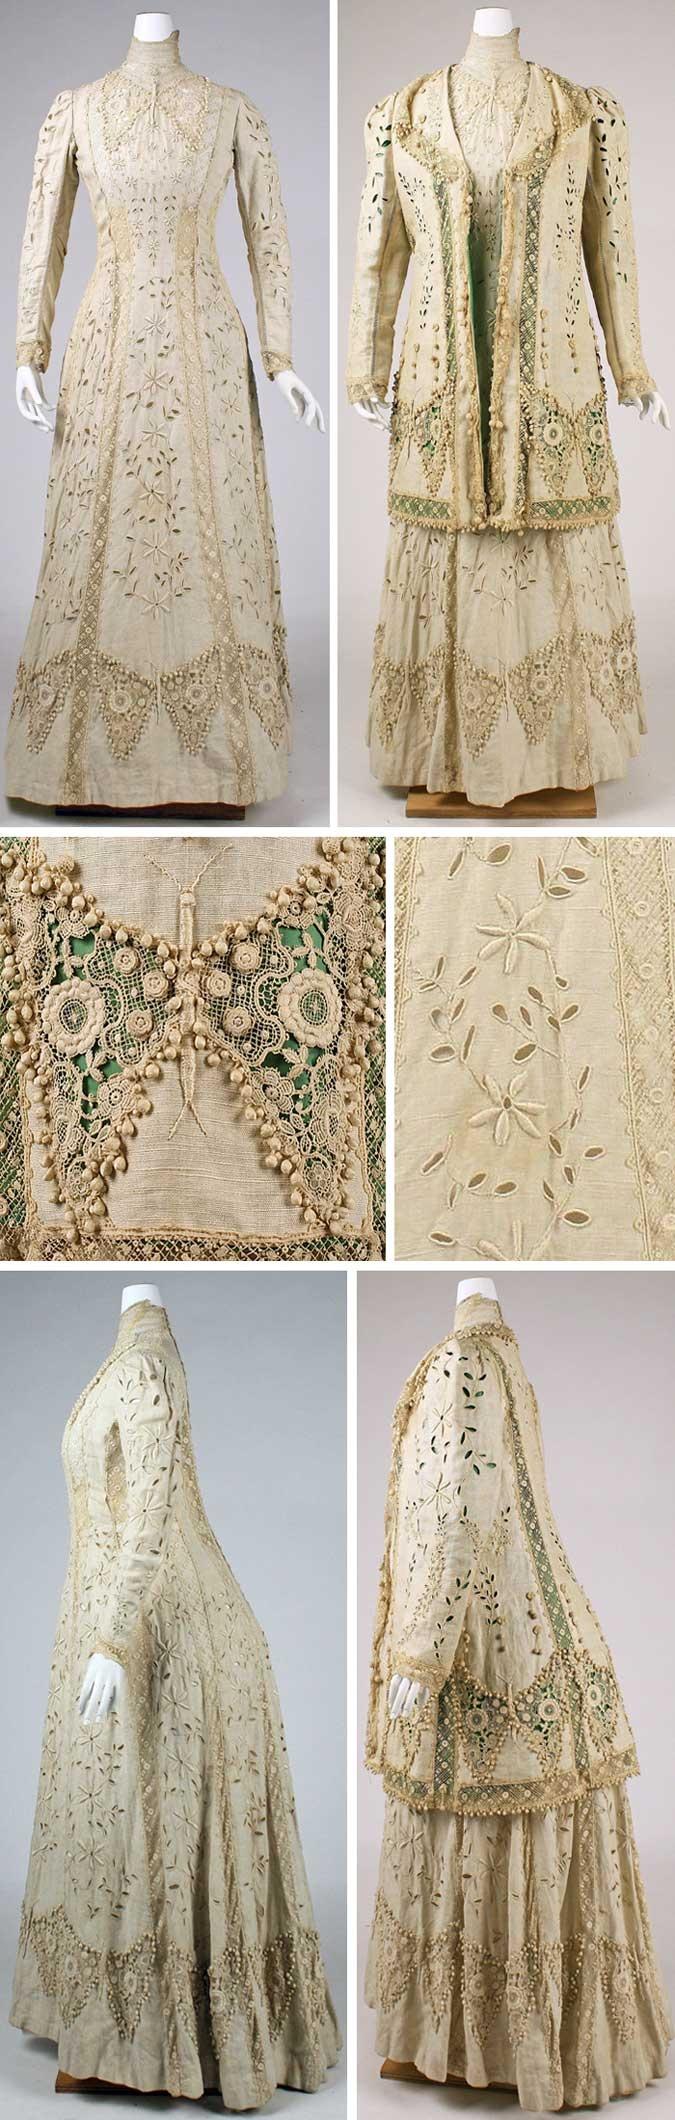 Ensemble, American or European, ca. 1910. Linen and silk. Metropolitan Museum…